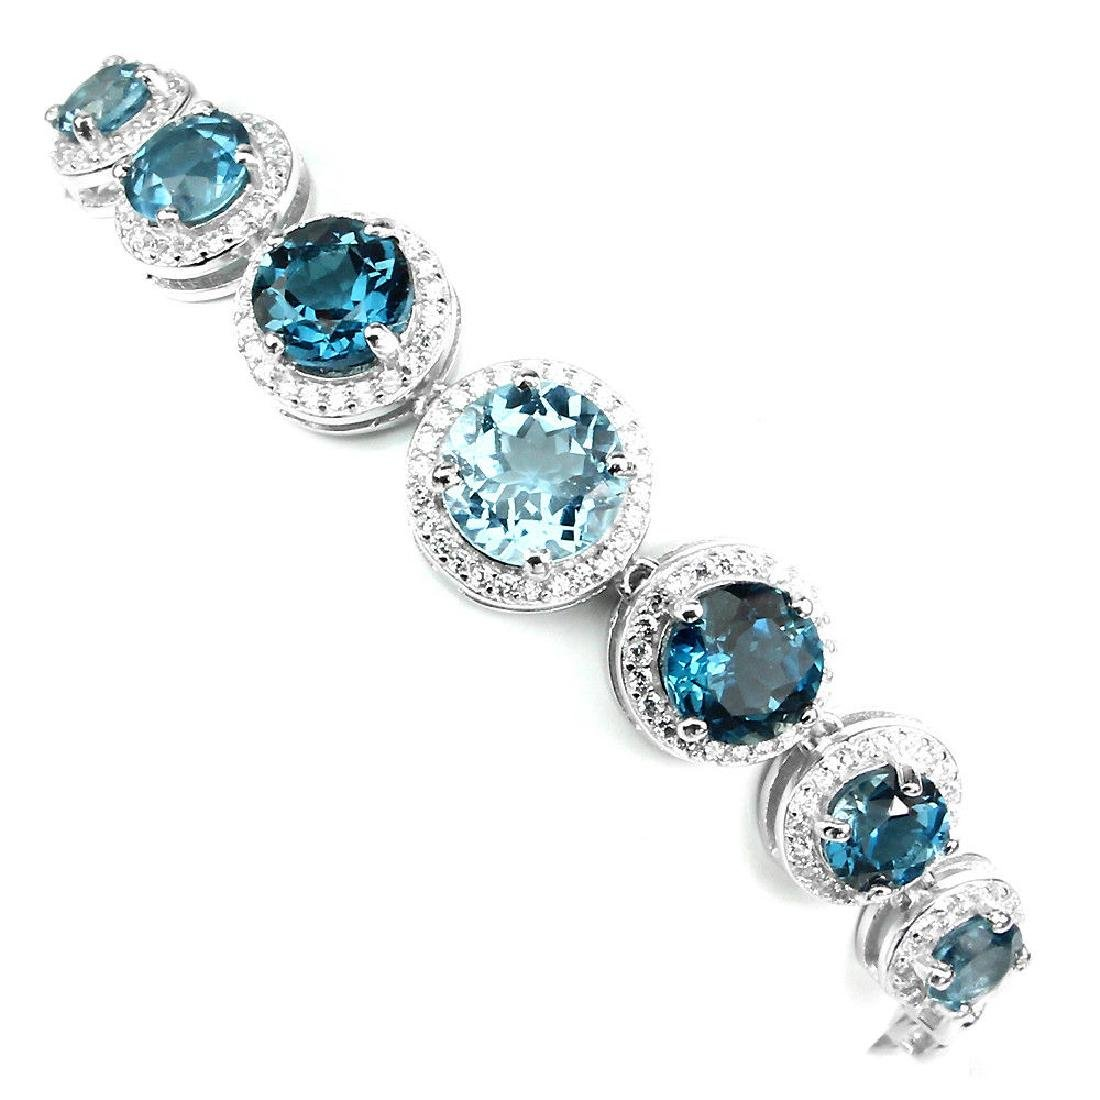 Natural London Blue Topaz Sky Blue Topaz Bracelet